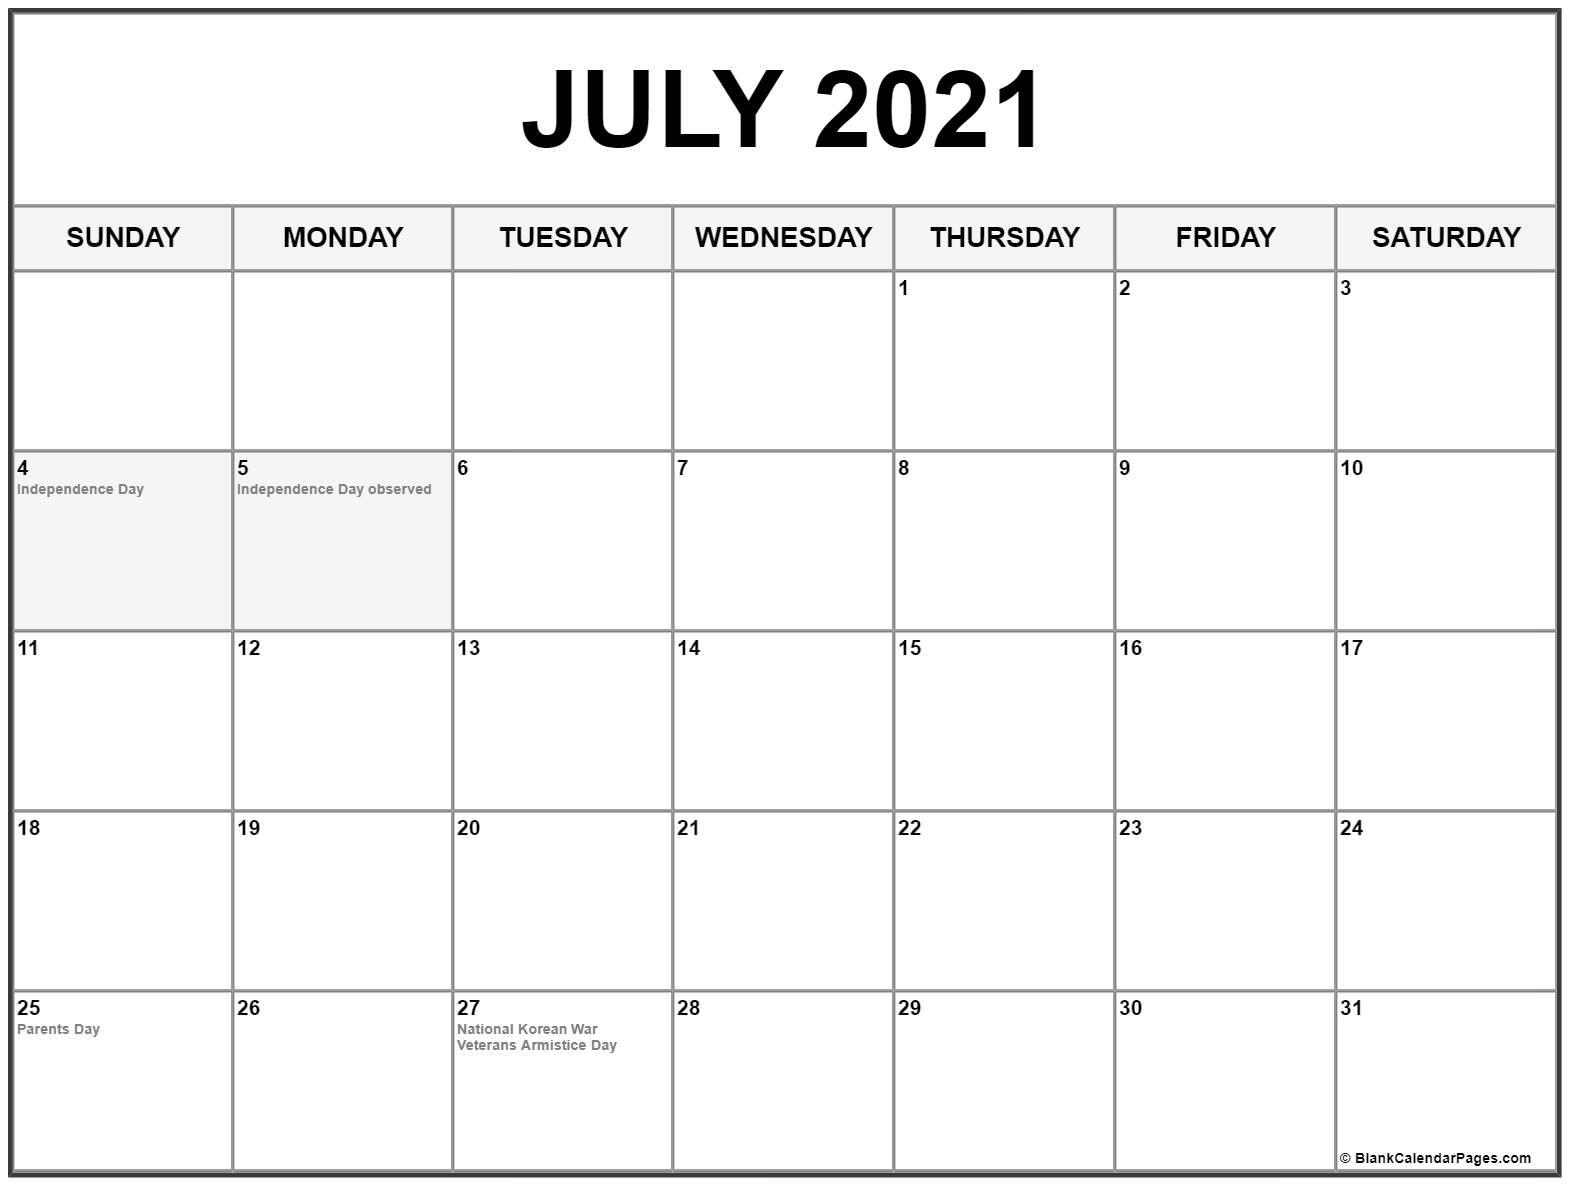 July 2021 US Calendar